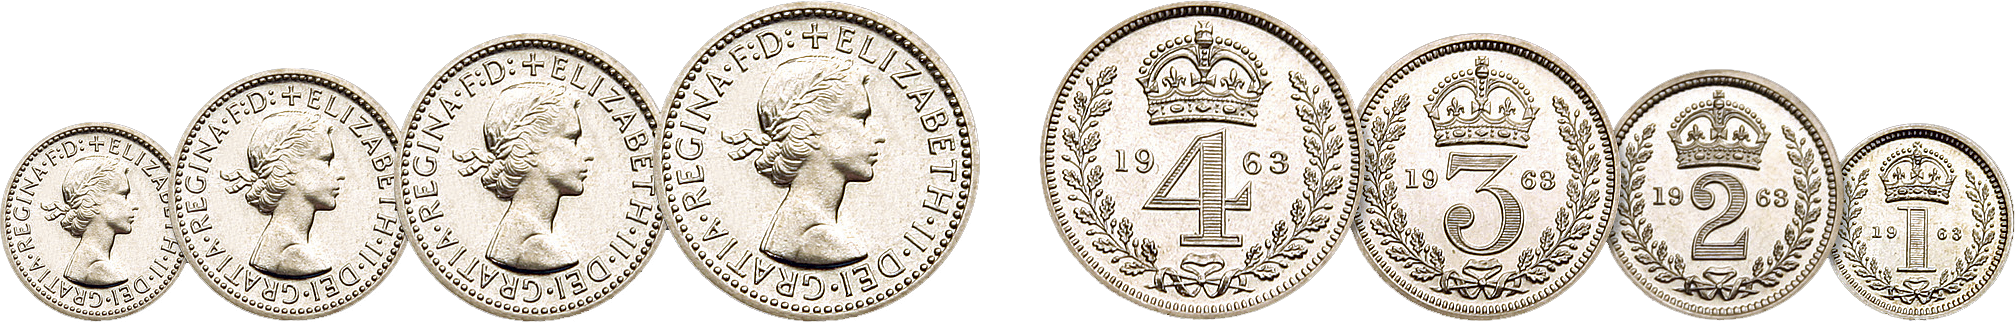 Skjærtorsdagmyntene, Elizabeth II, 1963